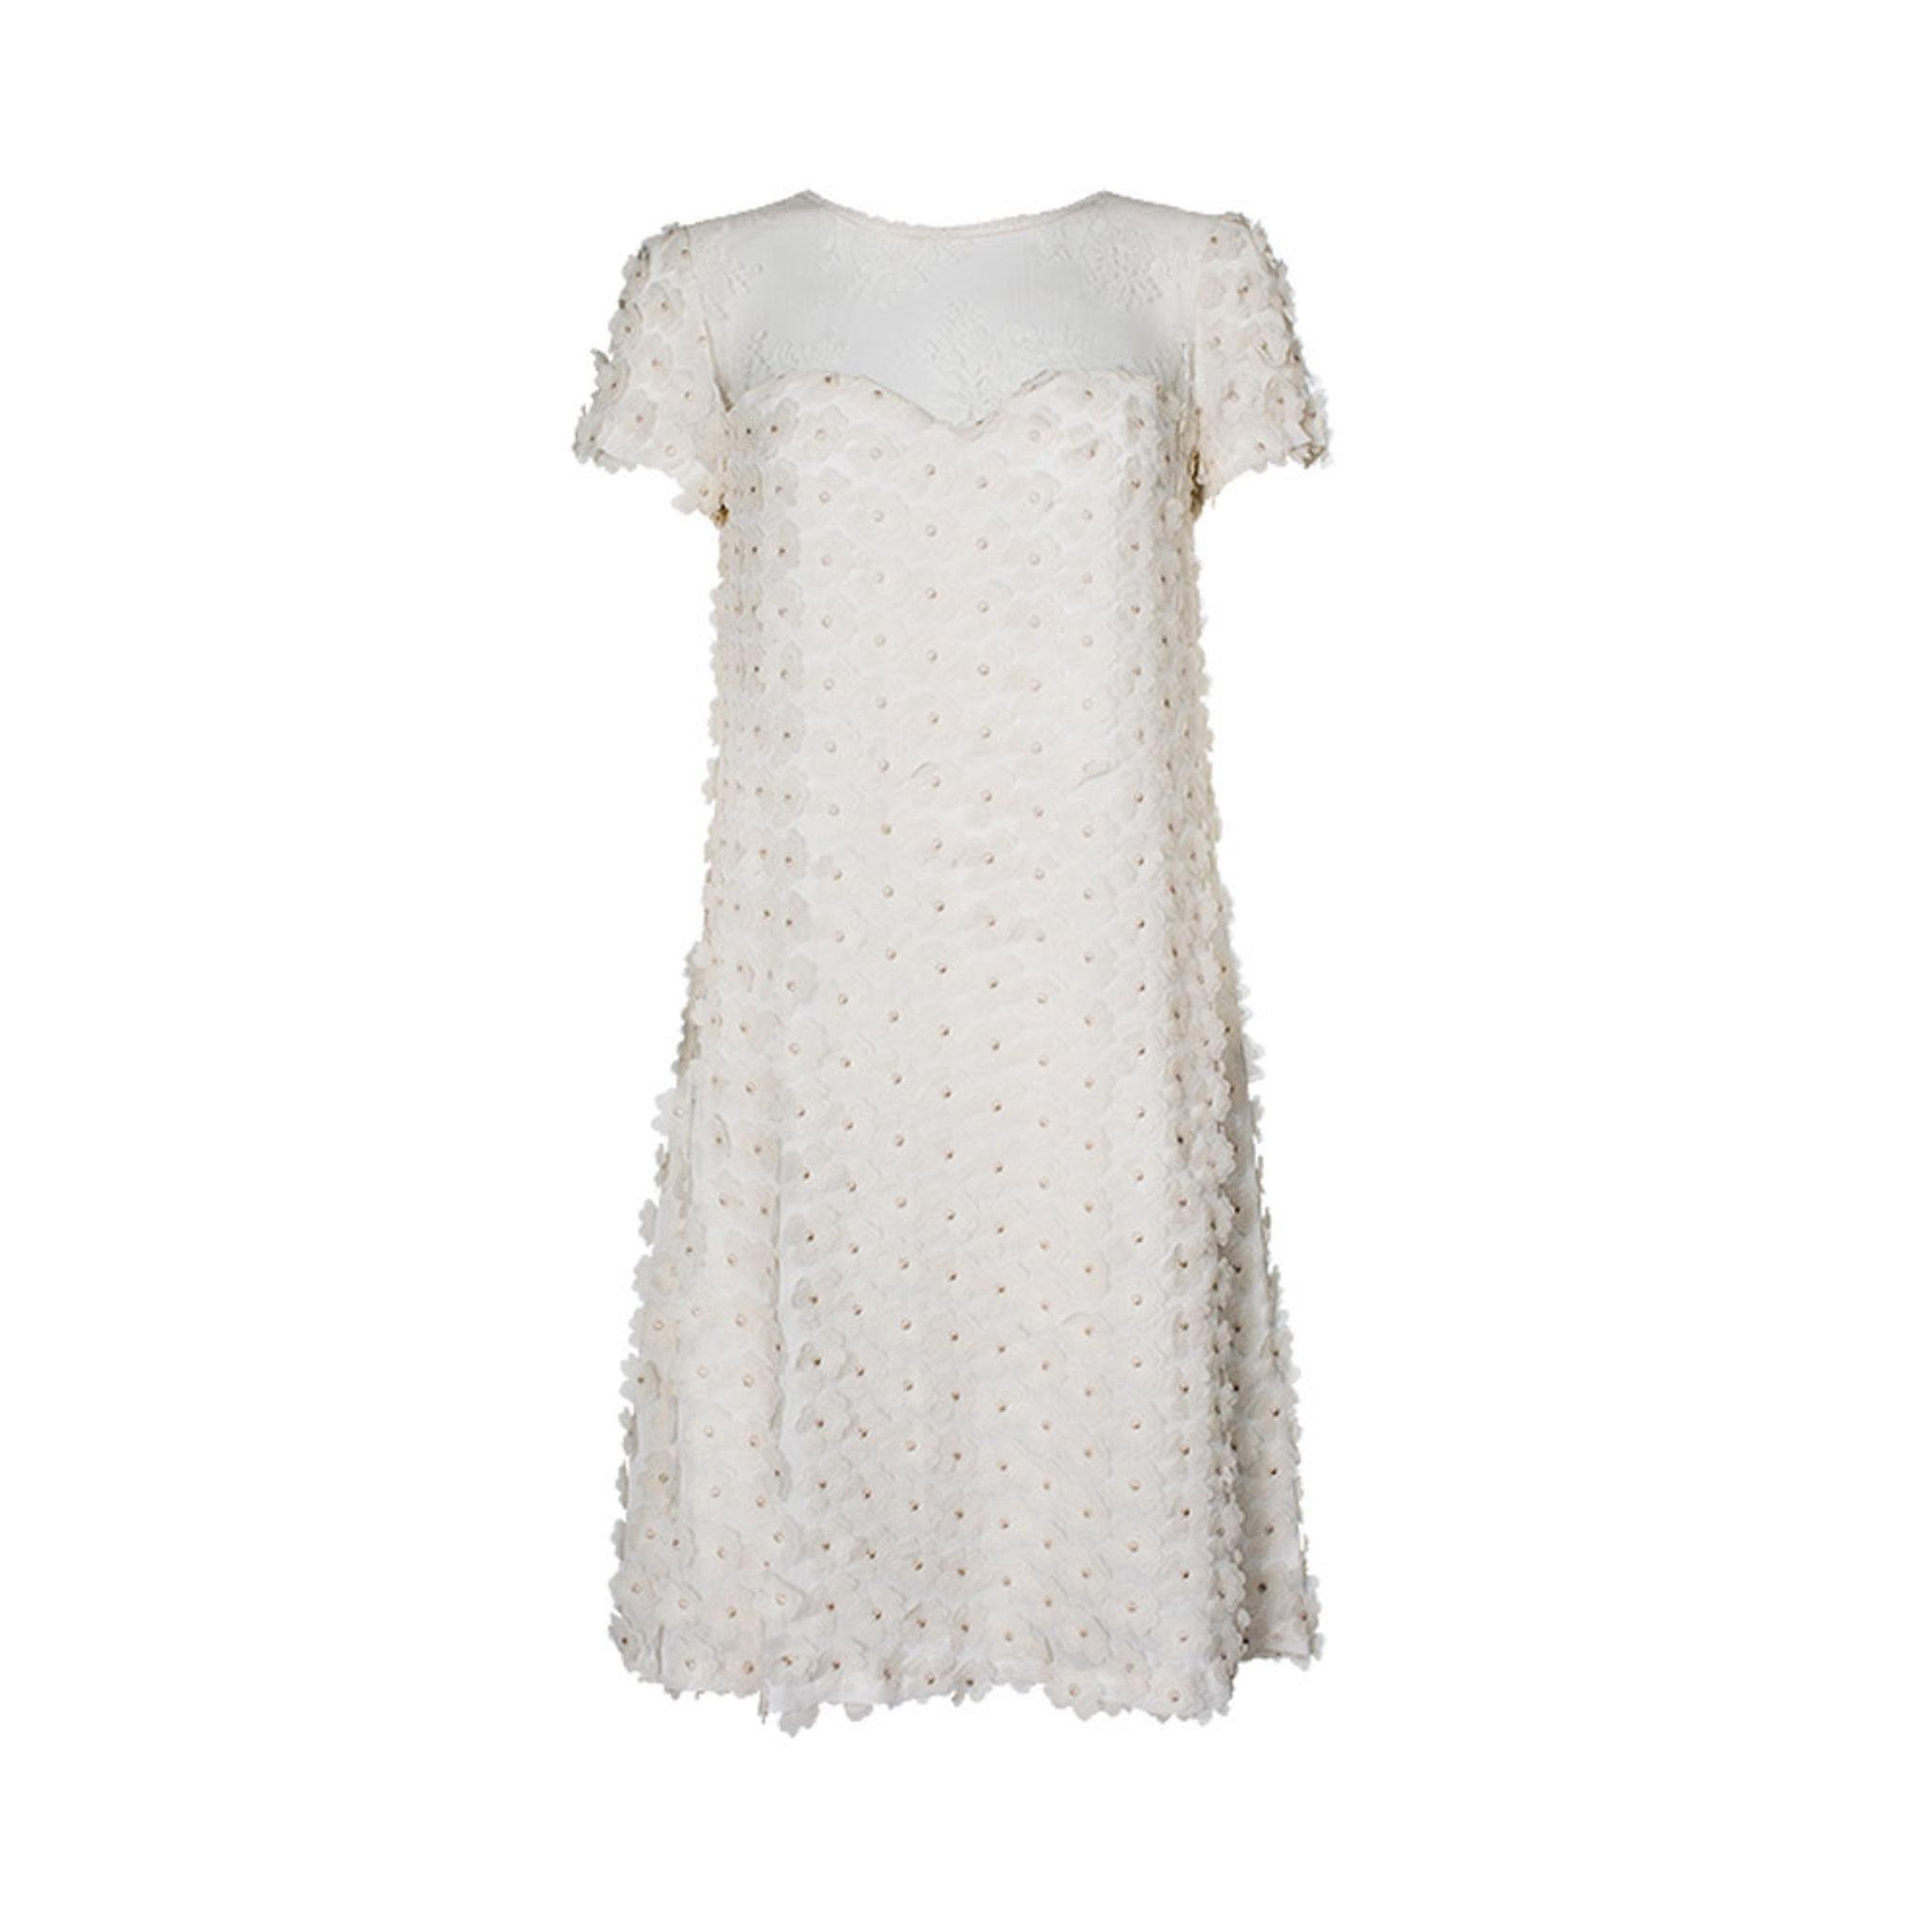 6c69472b7061 Emmeline Dress - Klänningar - Köp online på åhlens.se!